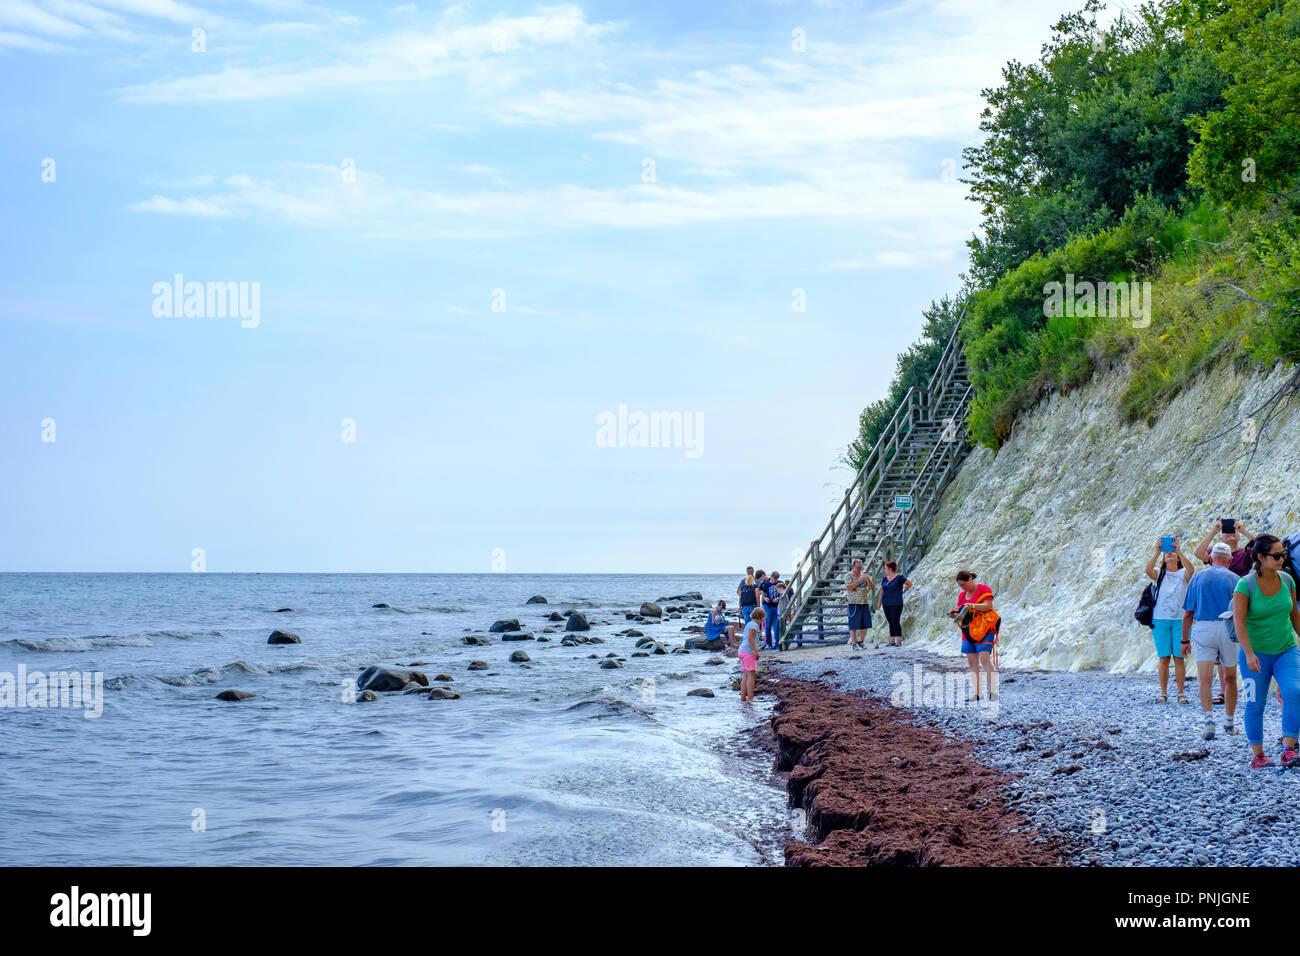 Moens Klint, the white cliffs of Moen, Moen Island, Denmark, Scandinavia, Europe. - Stock Image